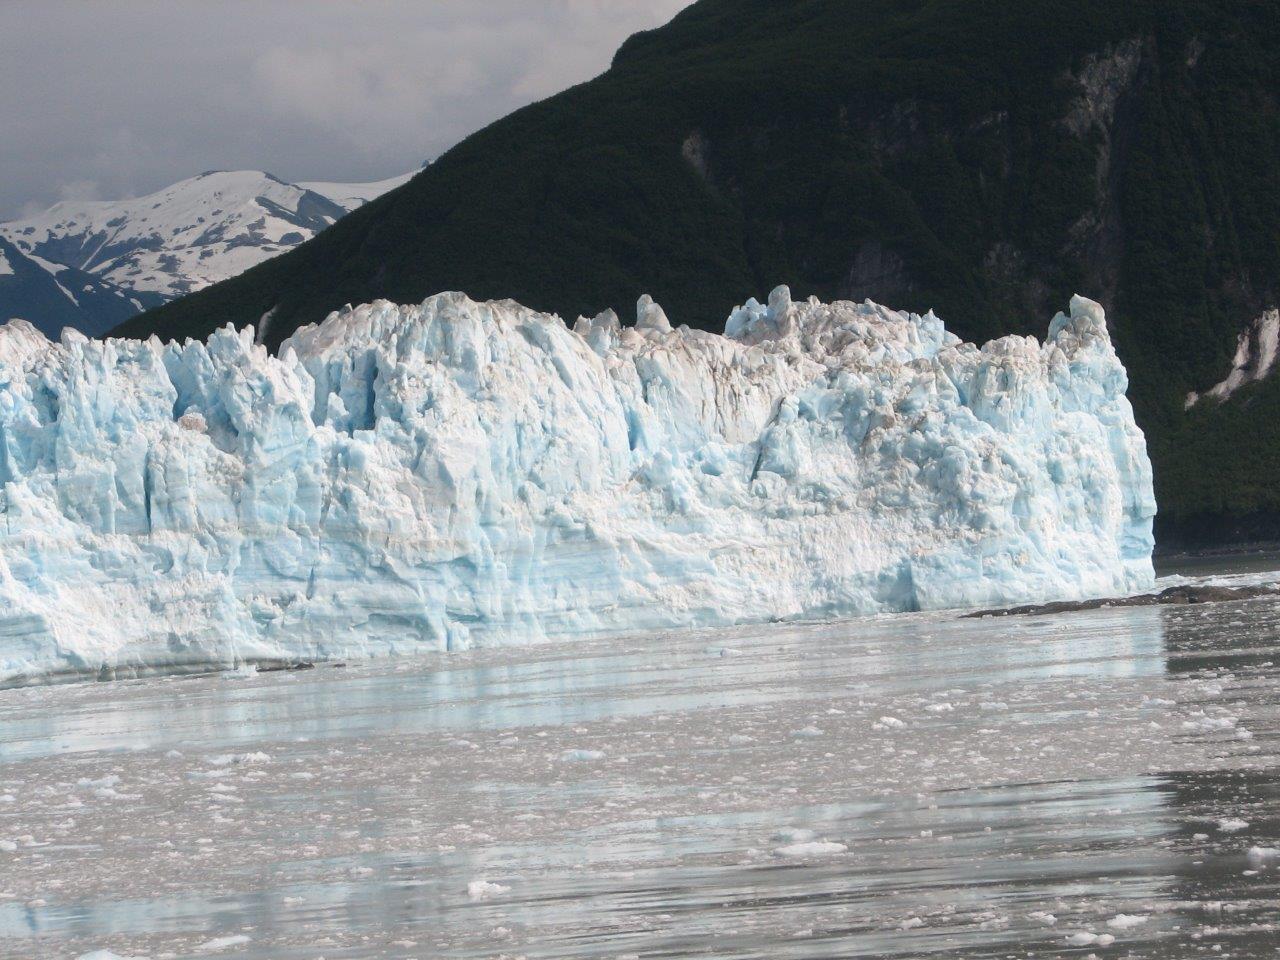 Alaska Cruise - Hubbard Glacier